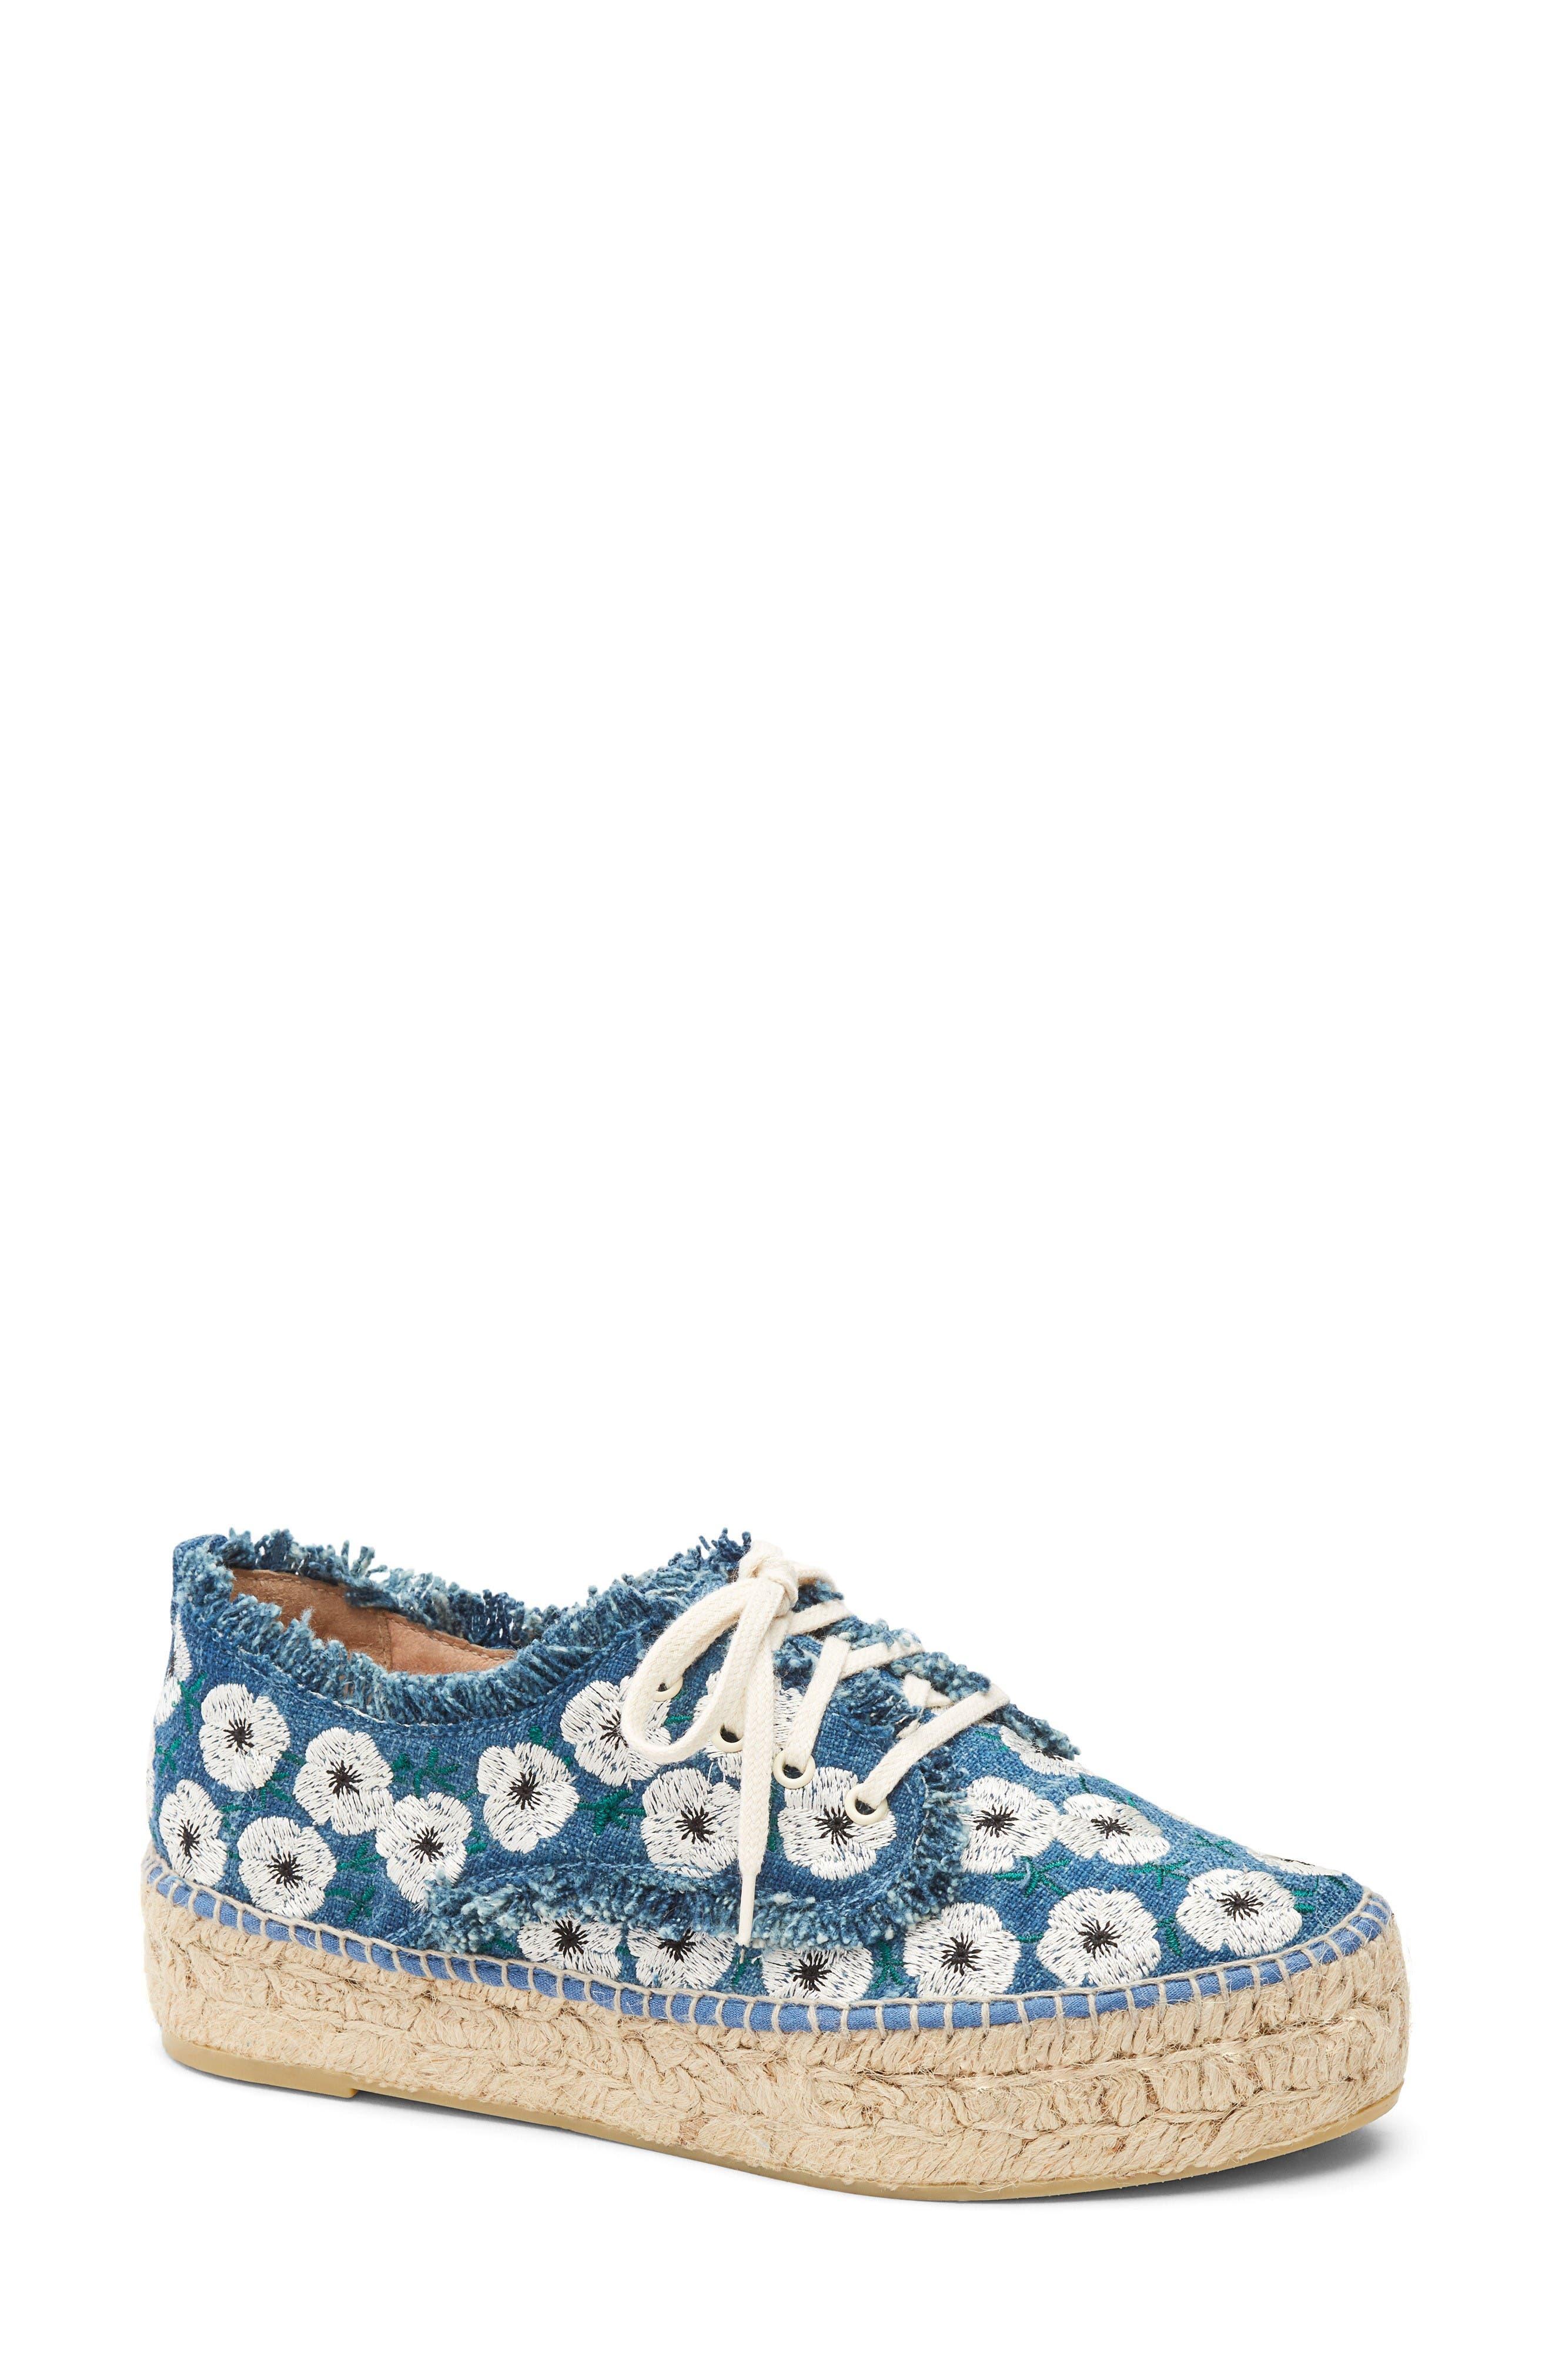 Loeffler Randall Alfie Espadrille Sneaker (Women)